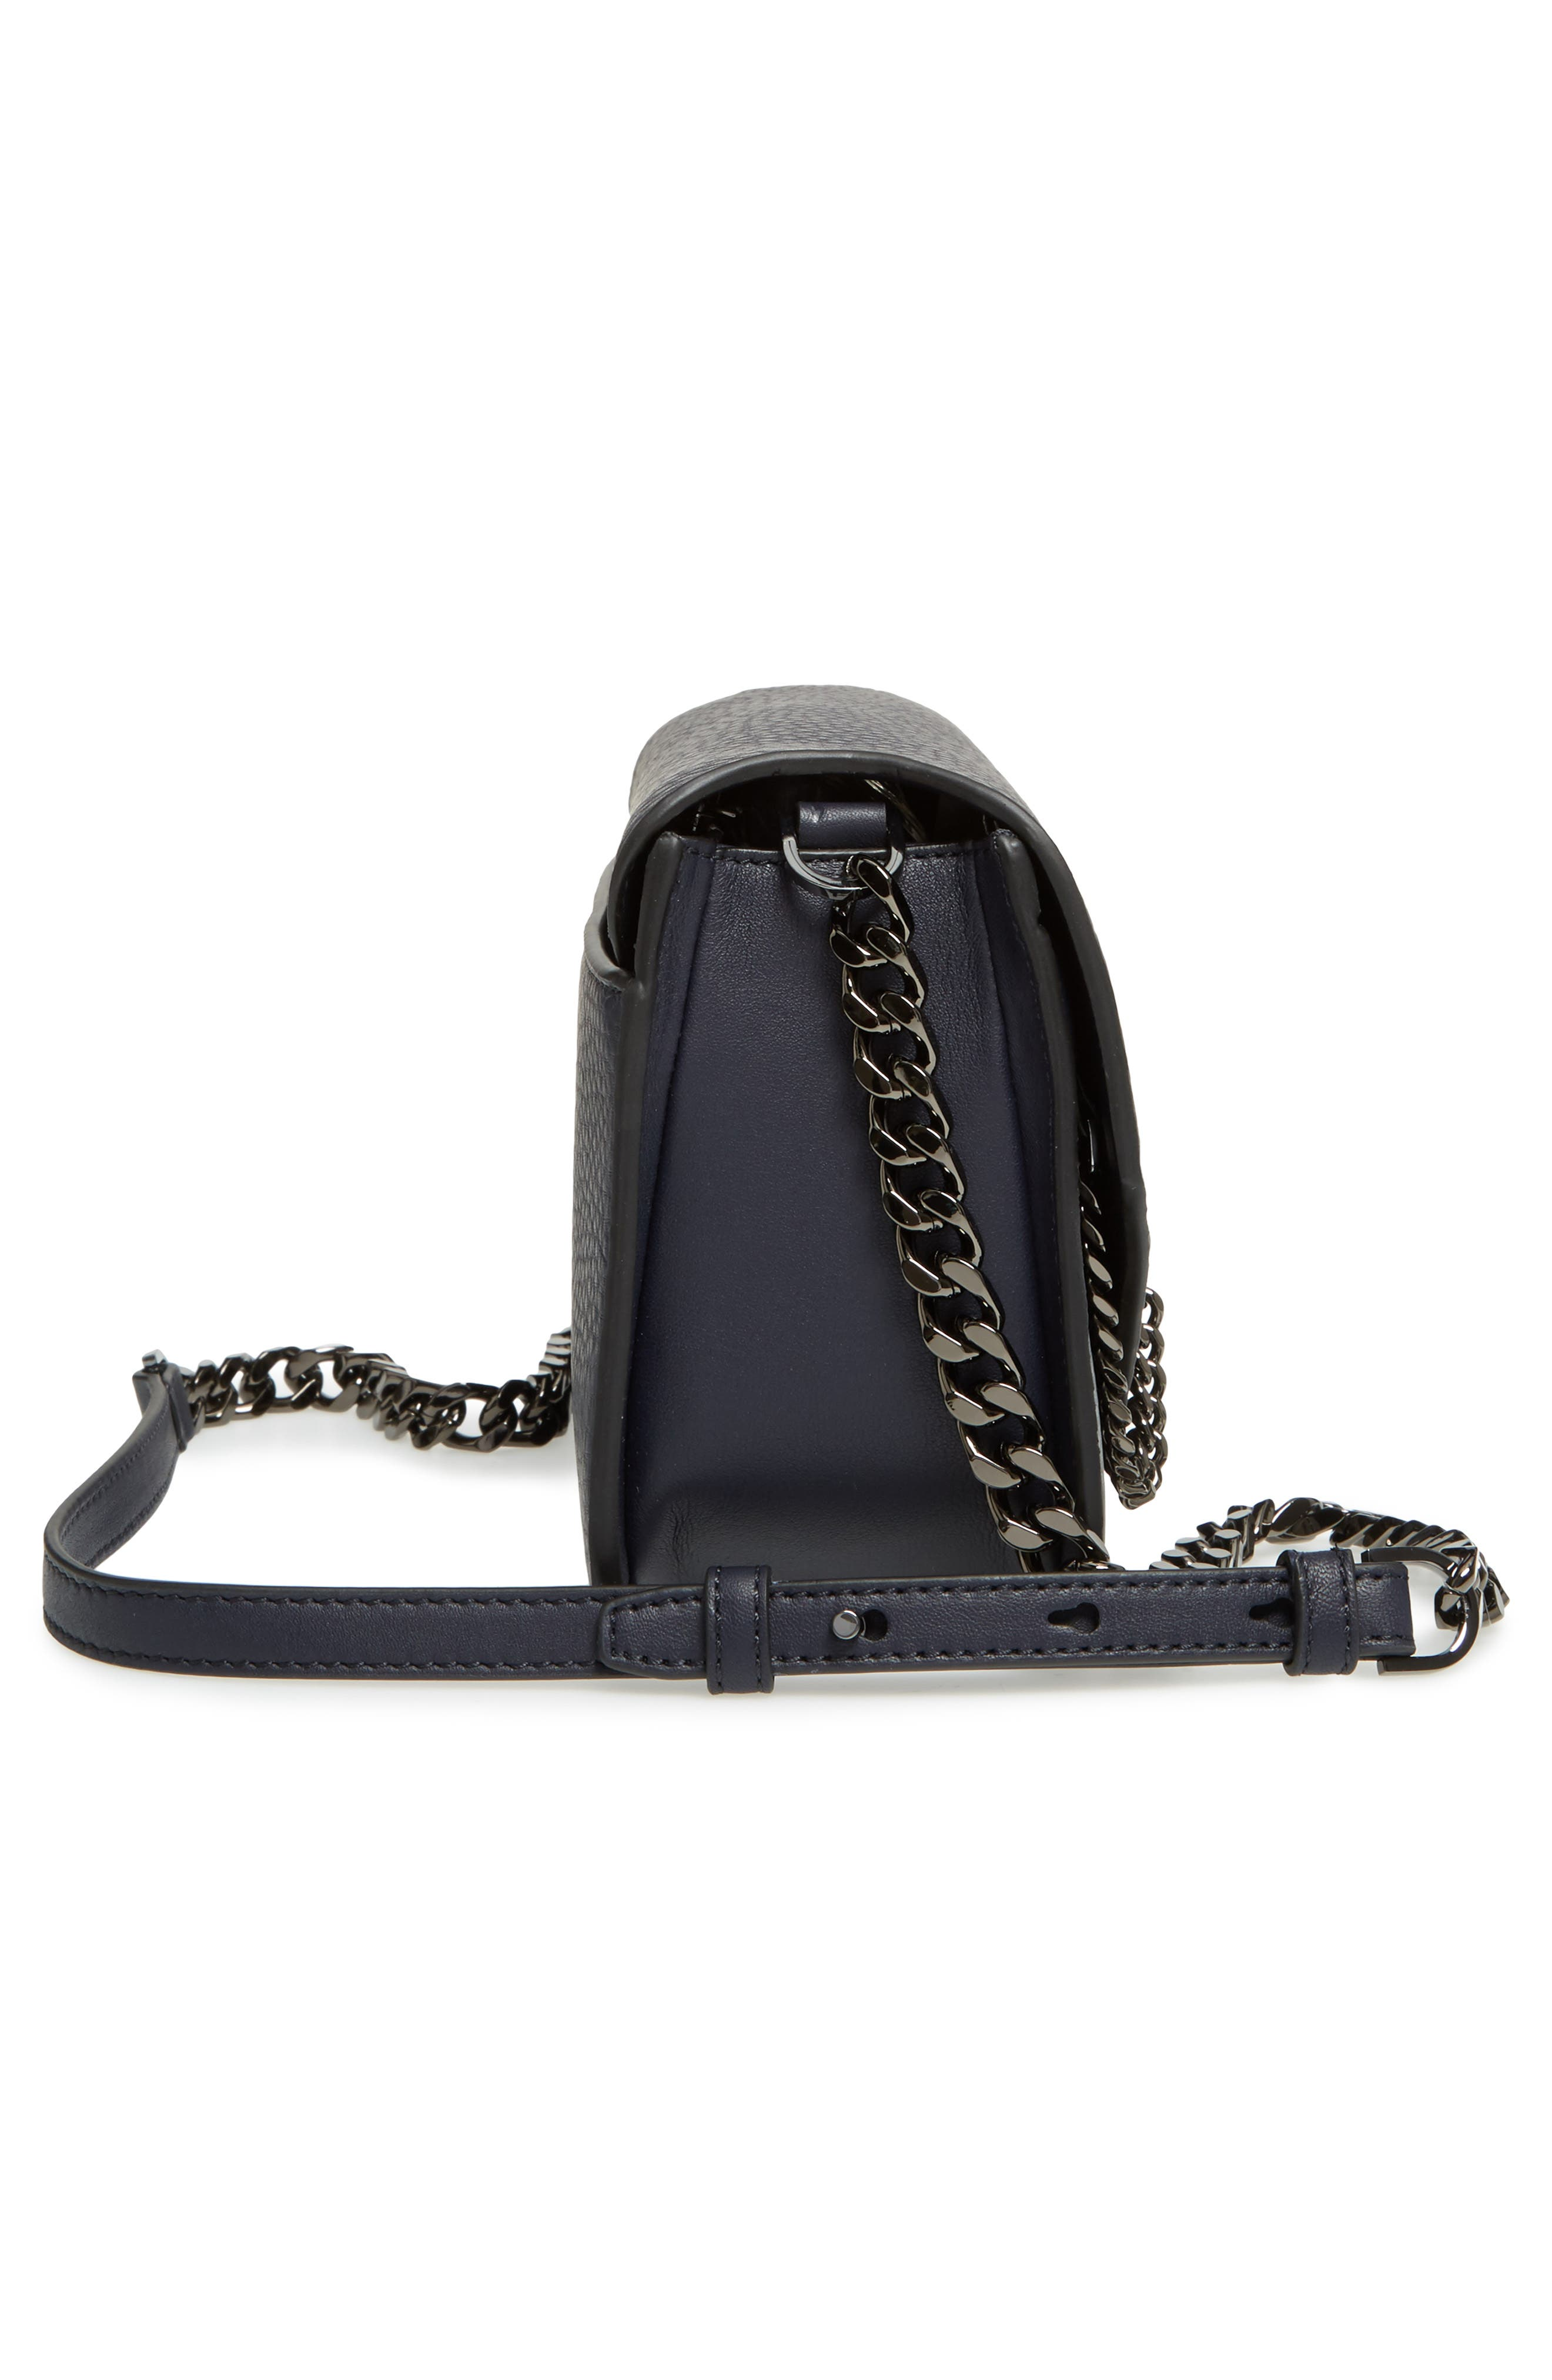 Cortney Nappa Leather Shoulder/Crossbody Bag,                             Alternate thumbnail 20, color,